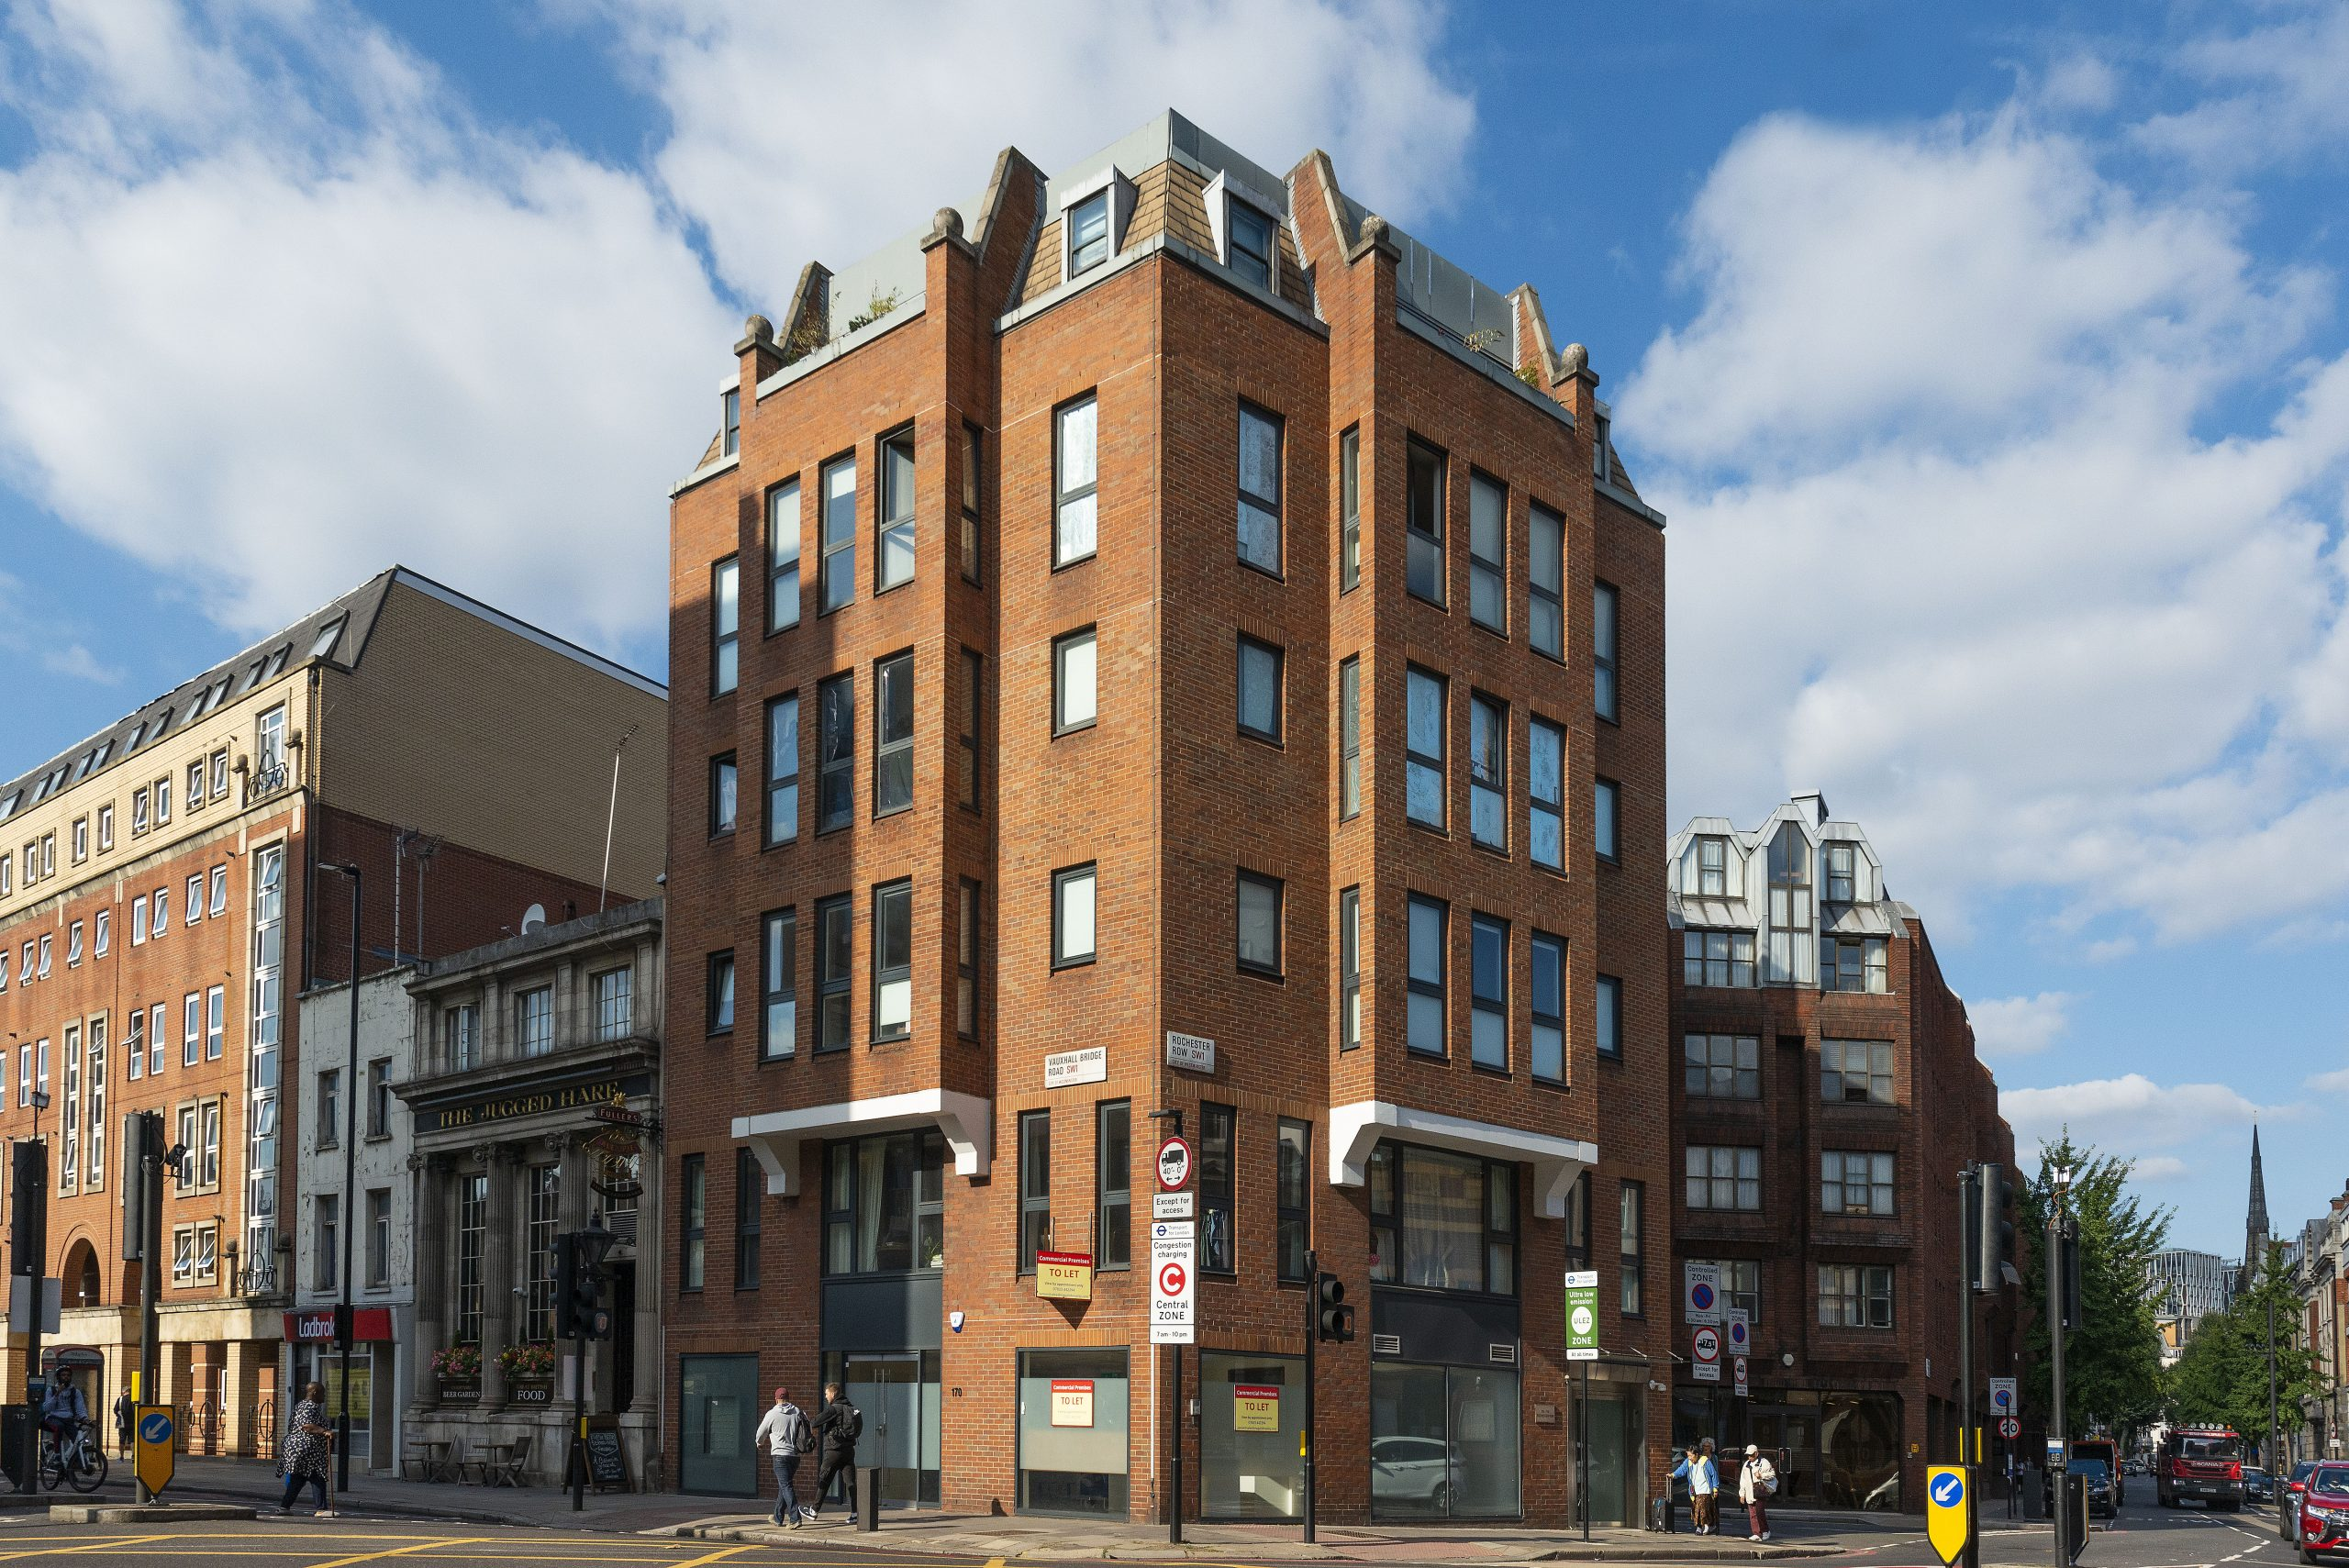 114 Rochester Row, London, SW1P 1JQ